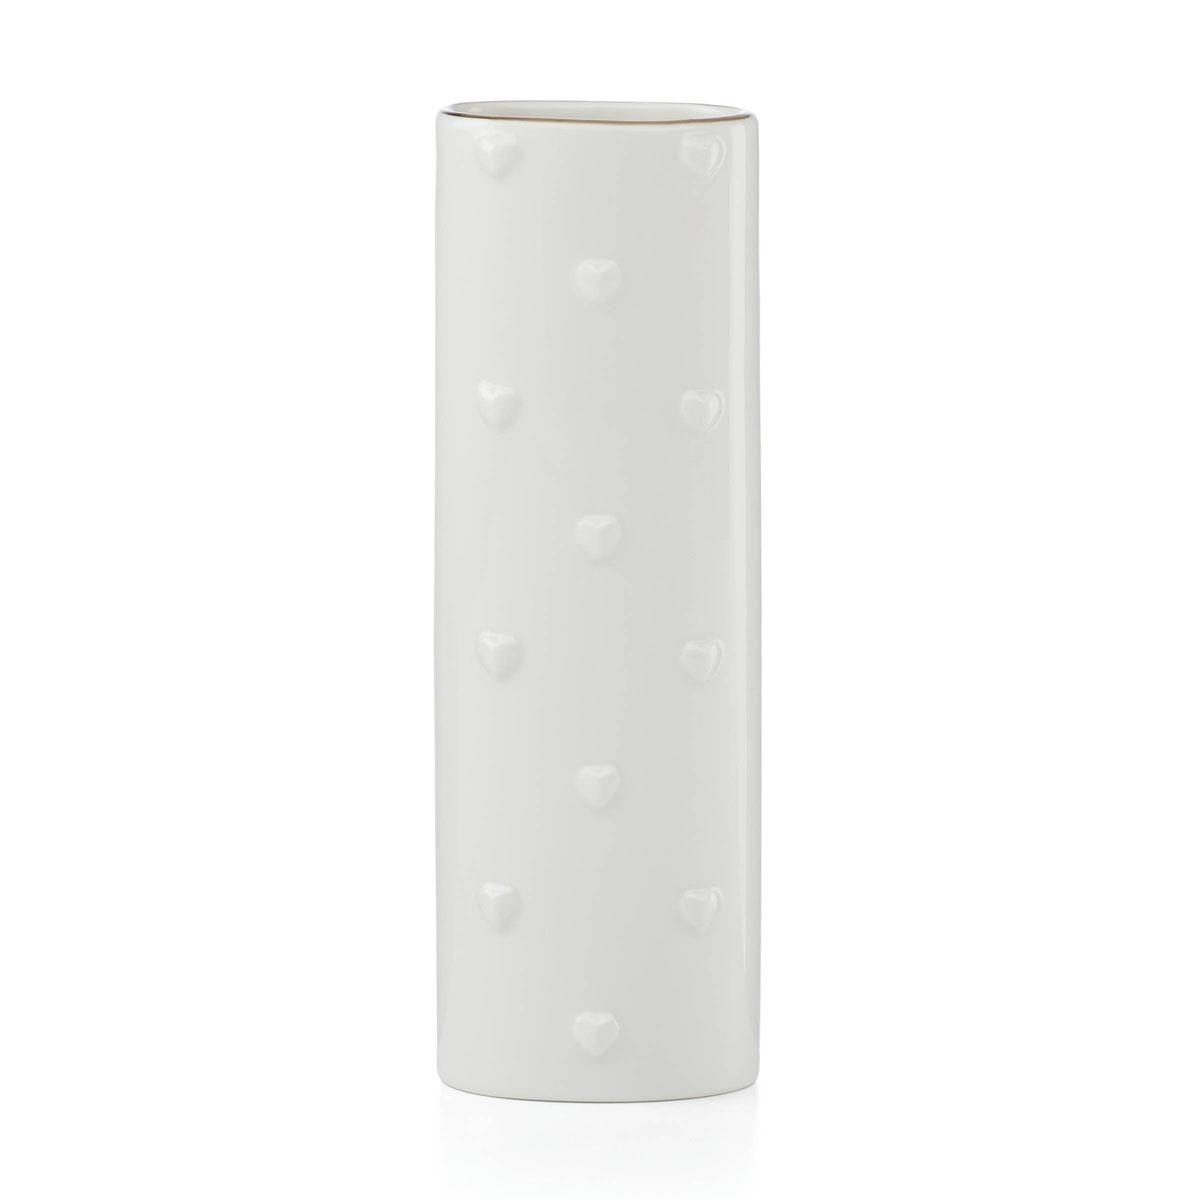 Kate Spade China by Lenox, Heart to Heart Porcelain Bud Oval Vase